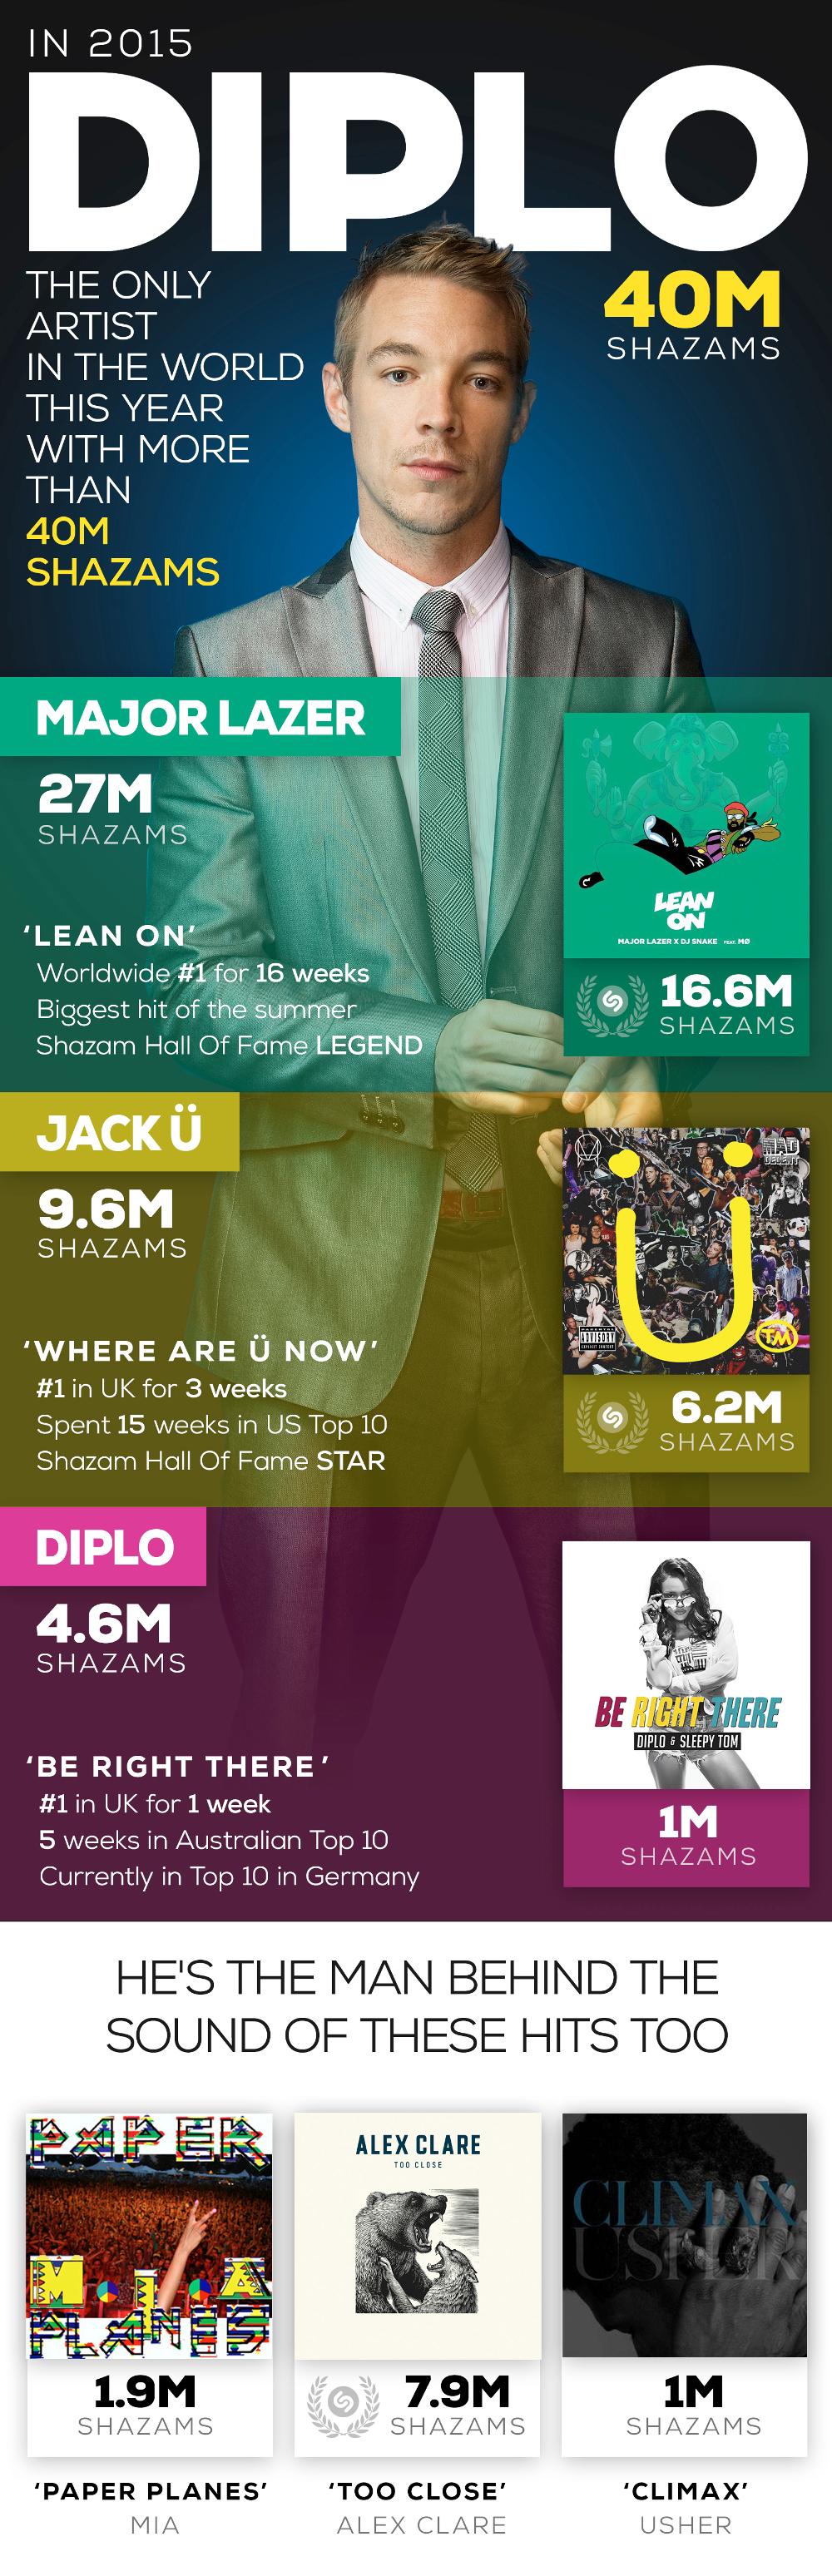 diplo-shazam-infographic